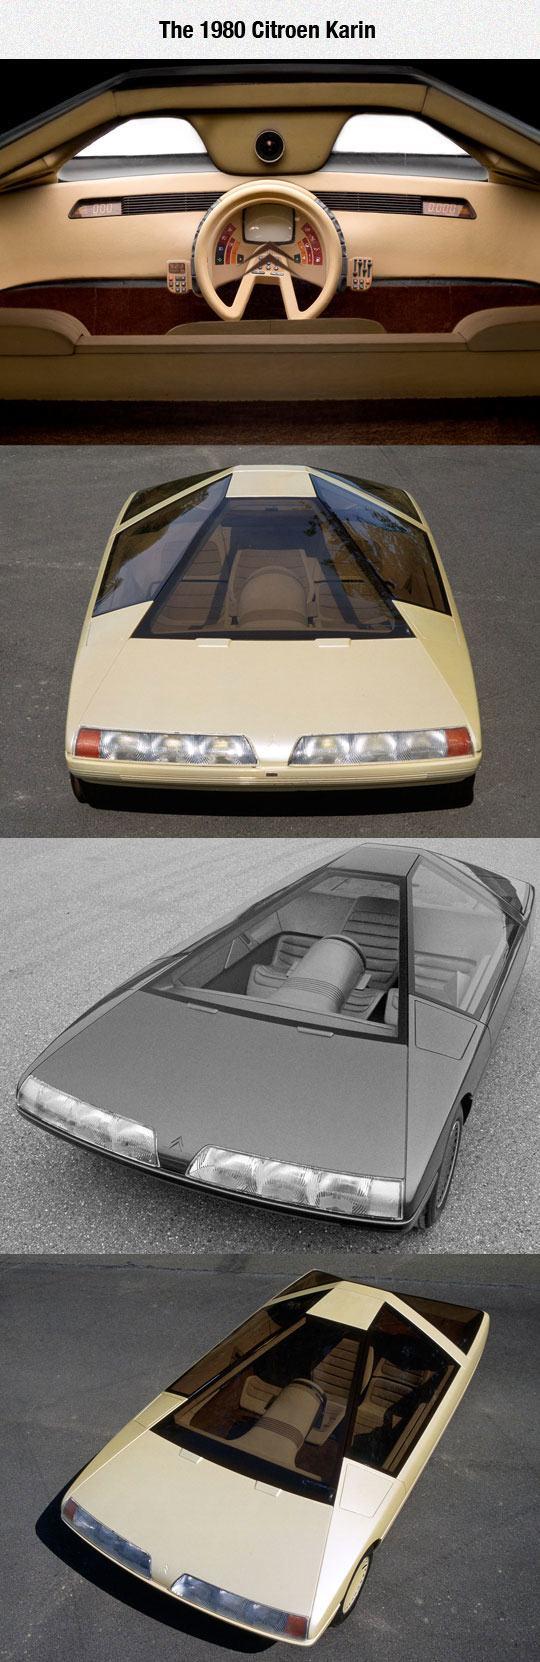 cool-Citroen-Karin-vintage-car-1